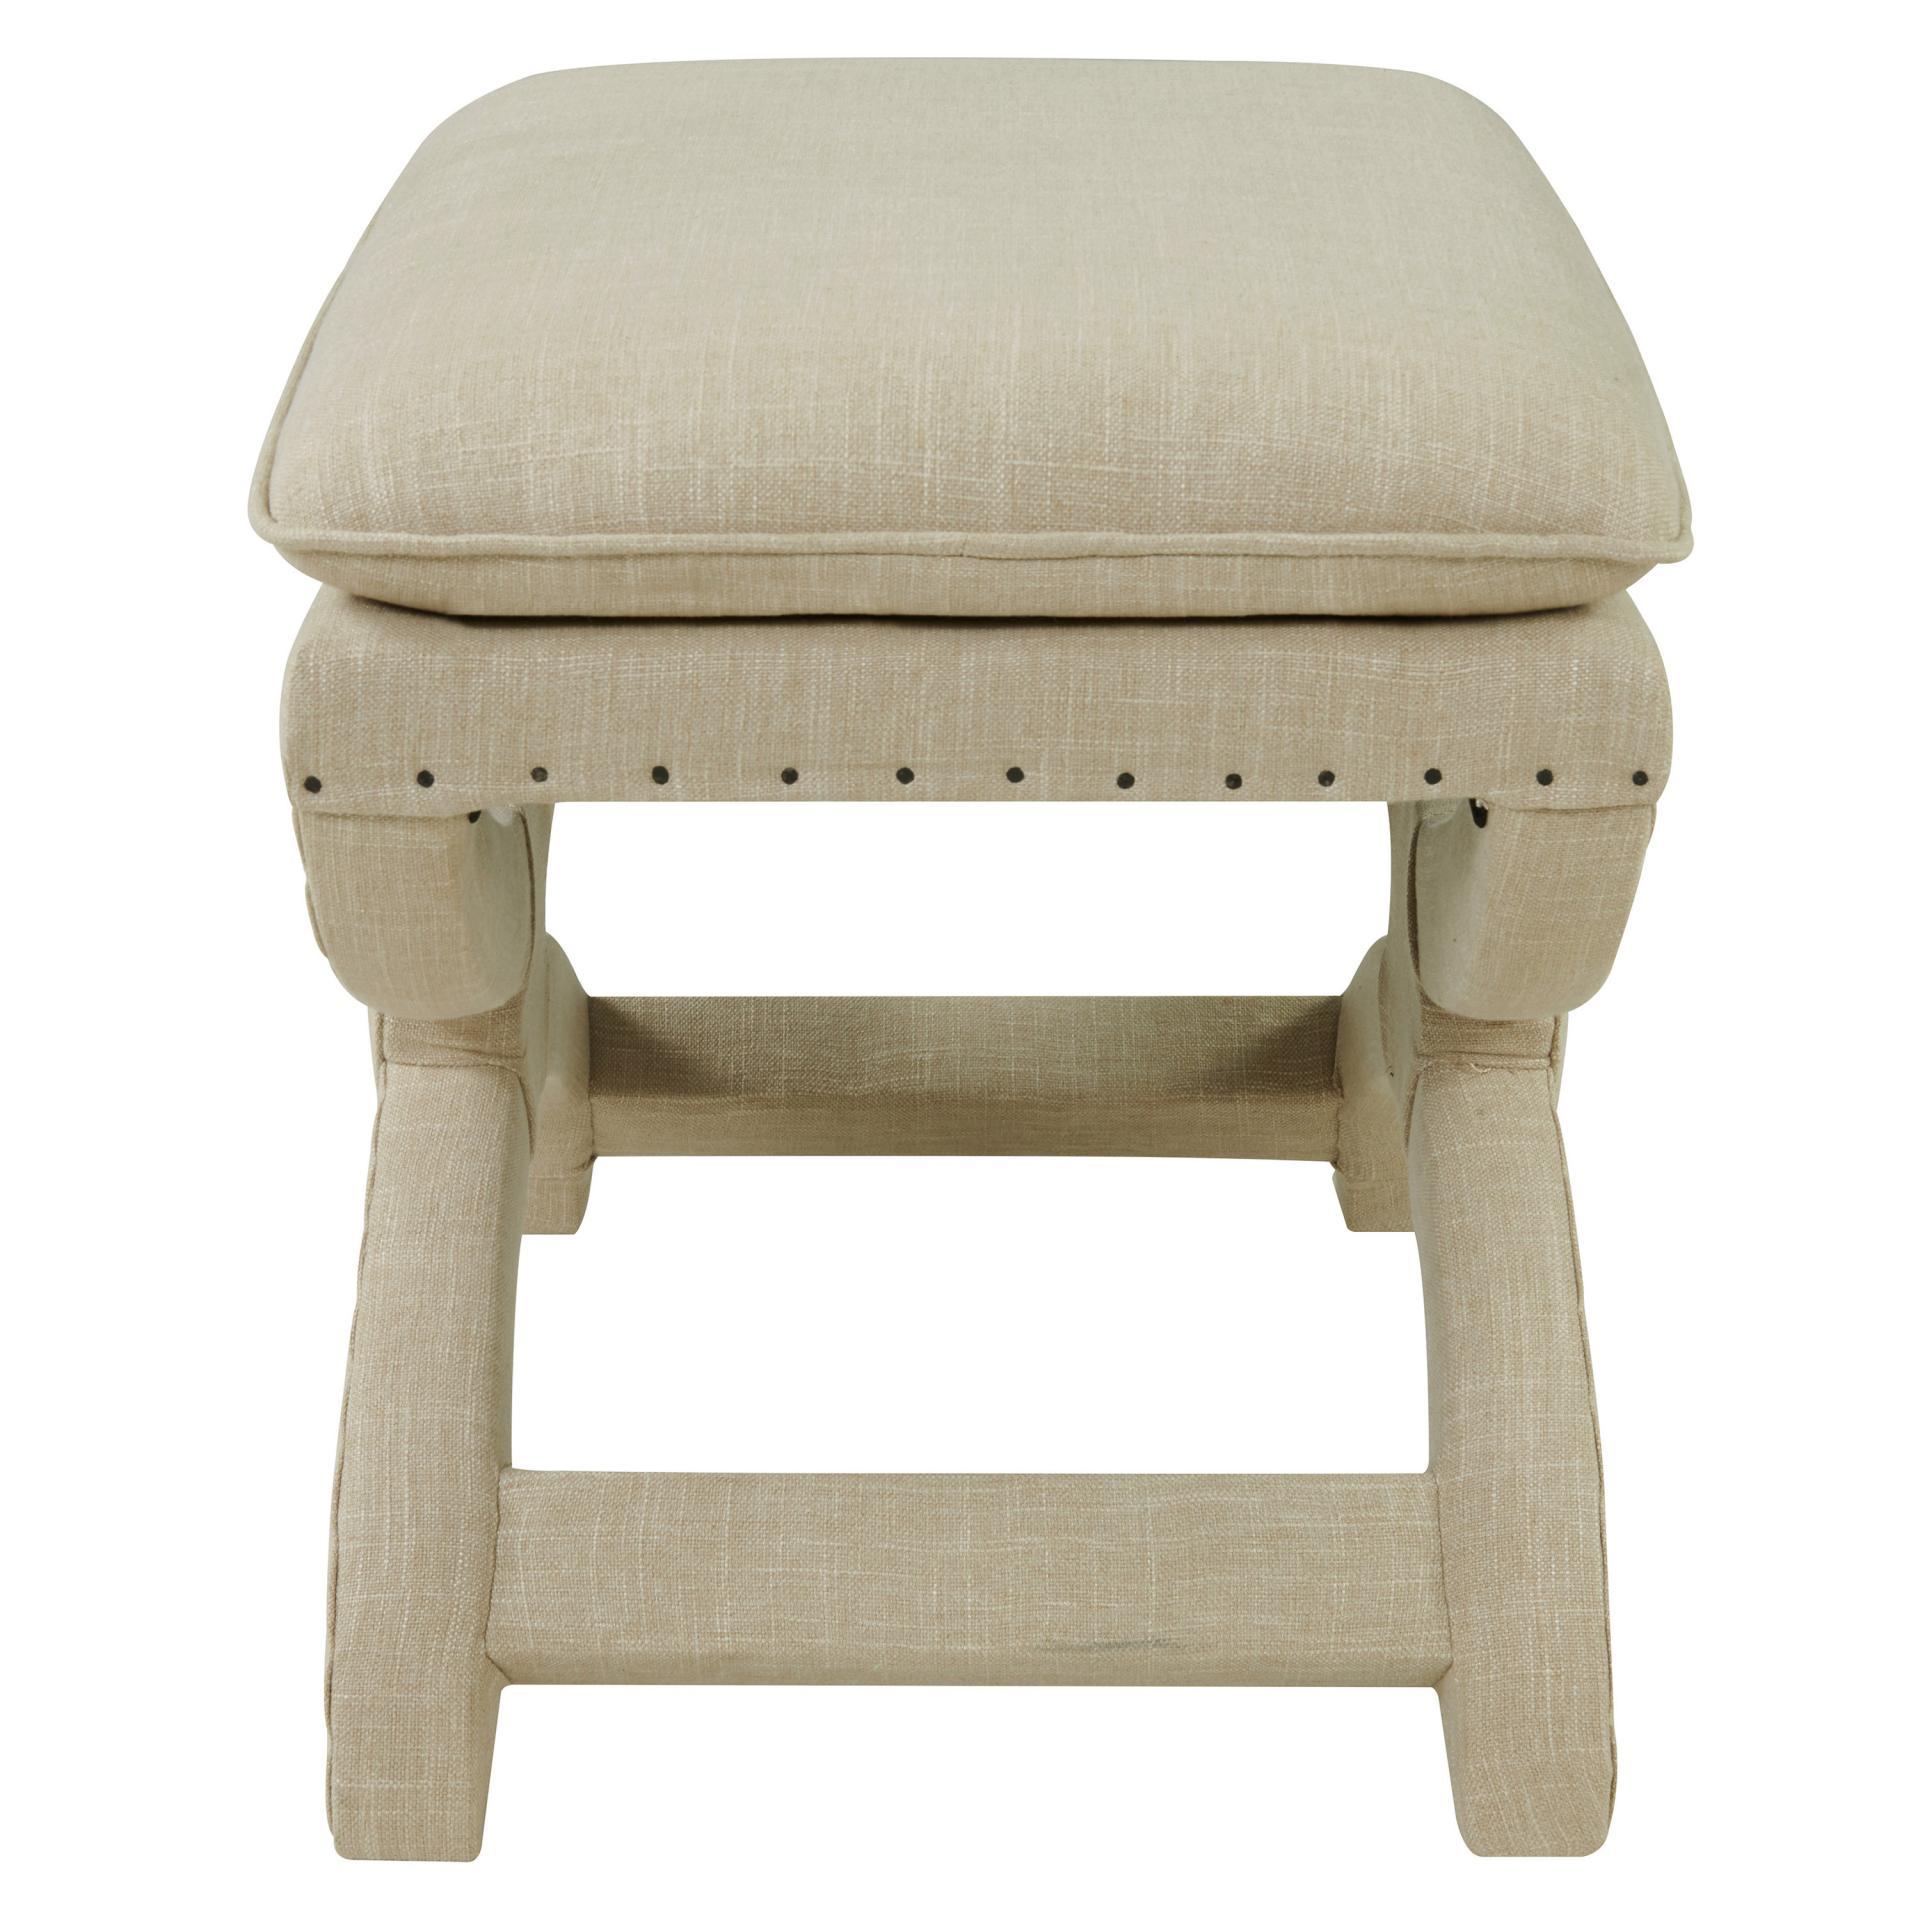 193039 F Npd Home Furniture Wholesale Lifestyle